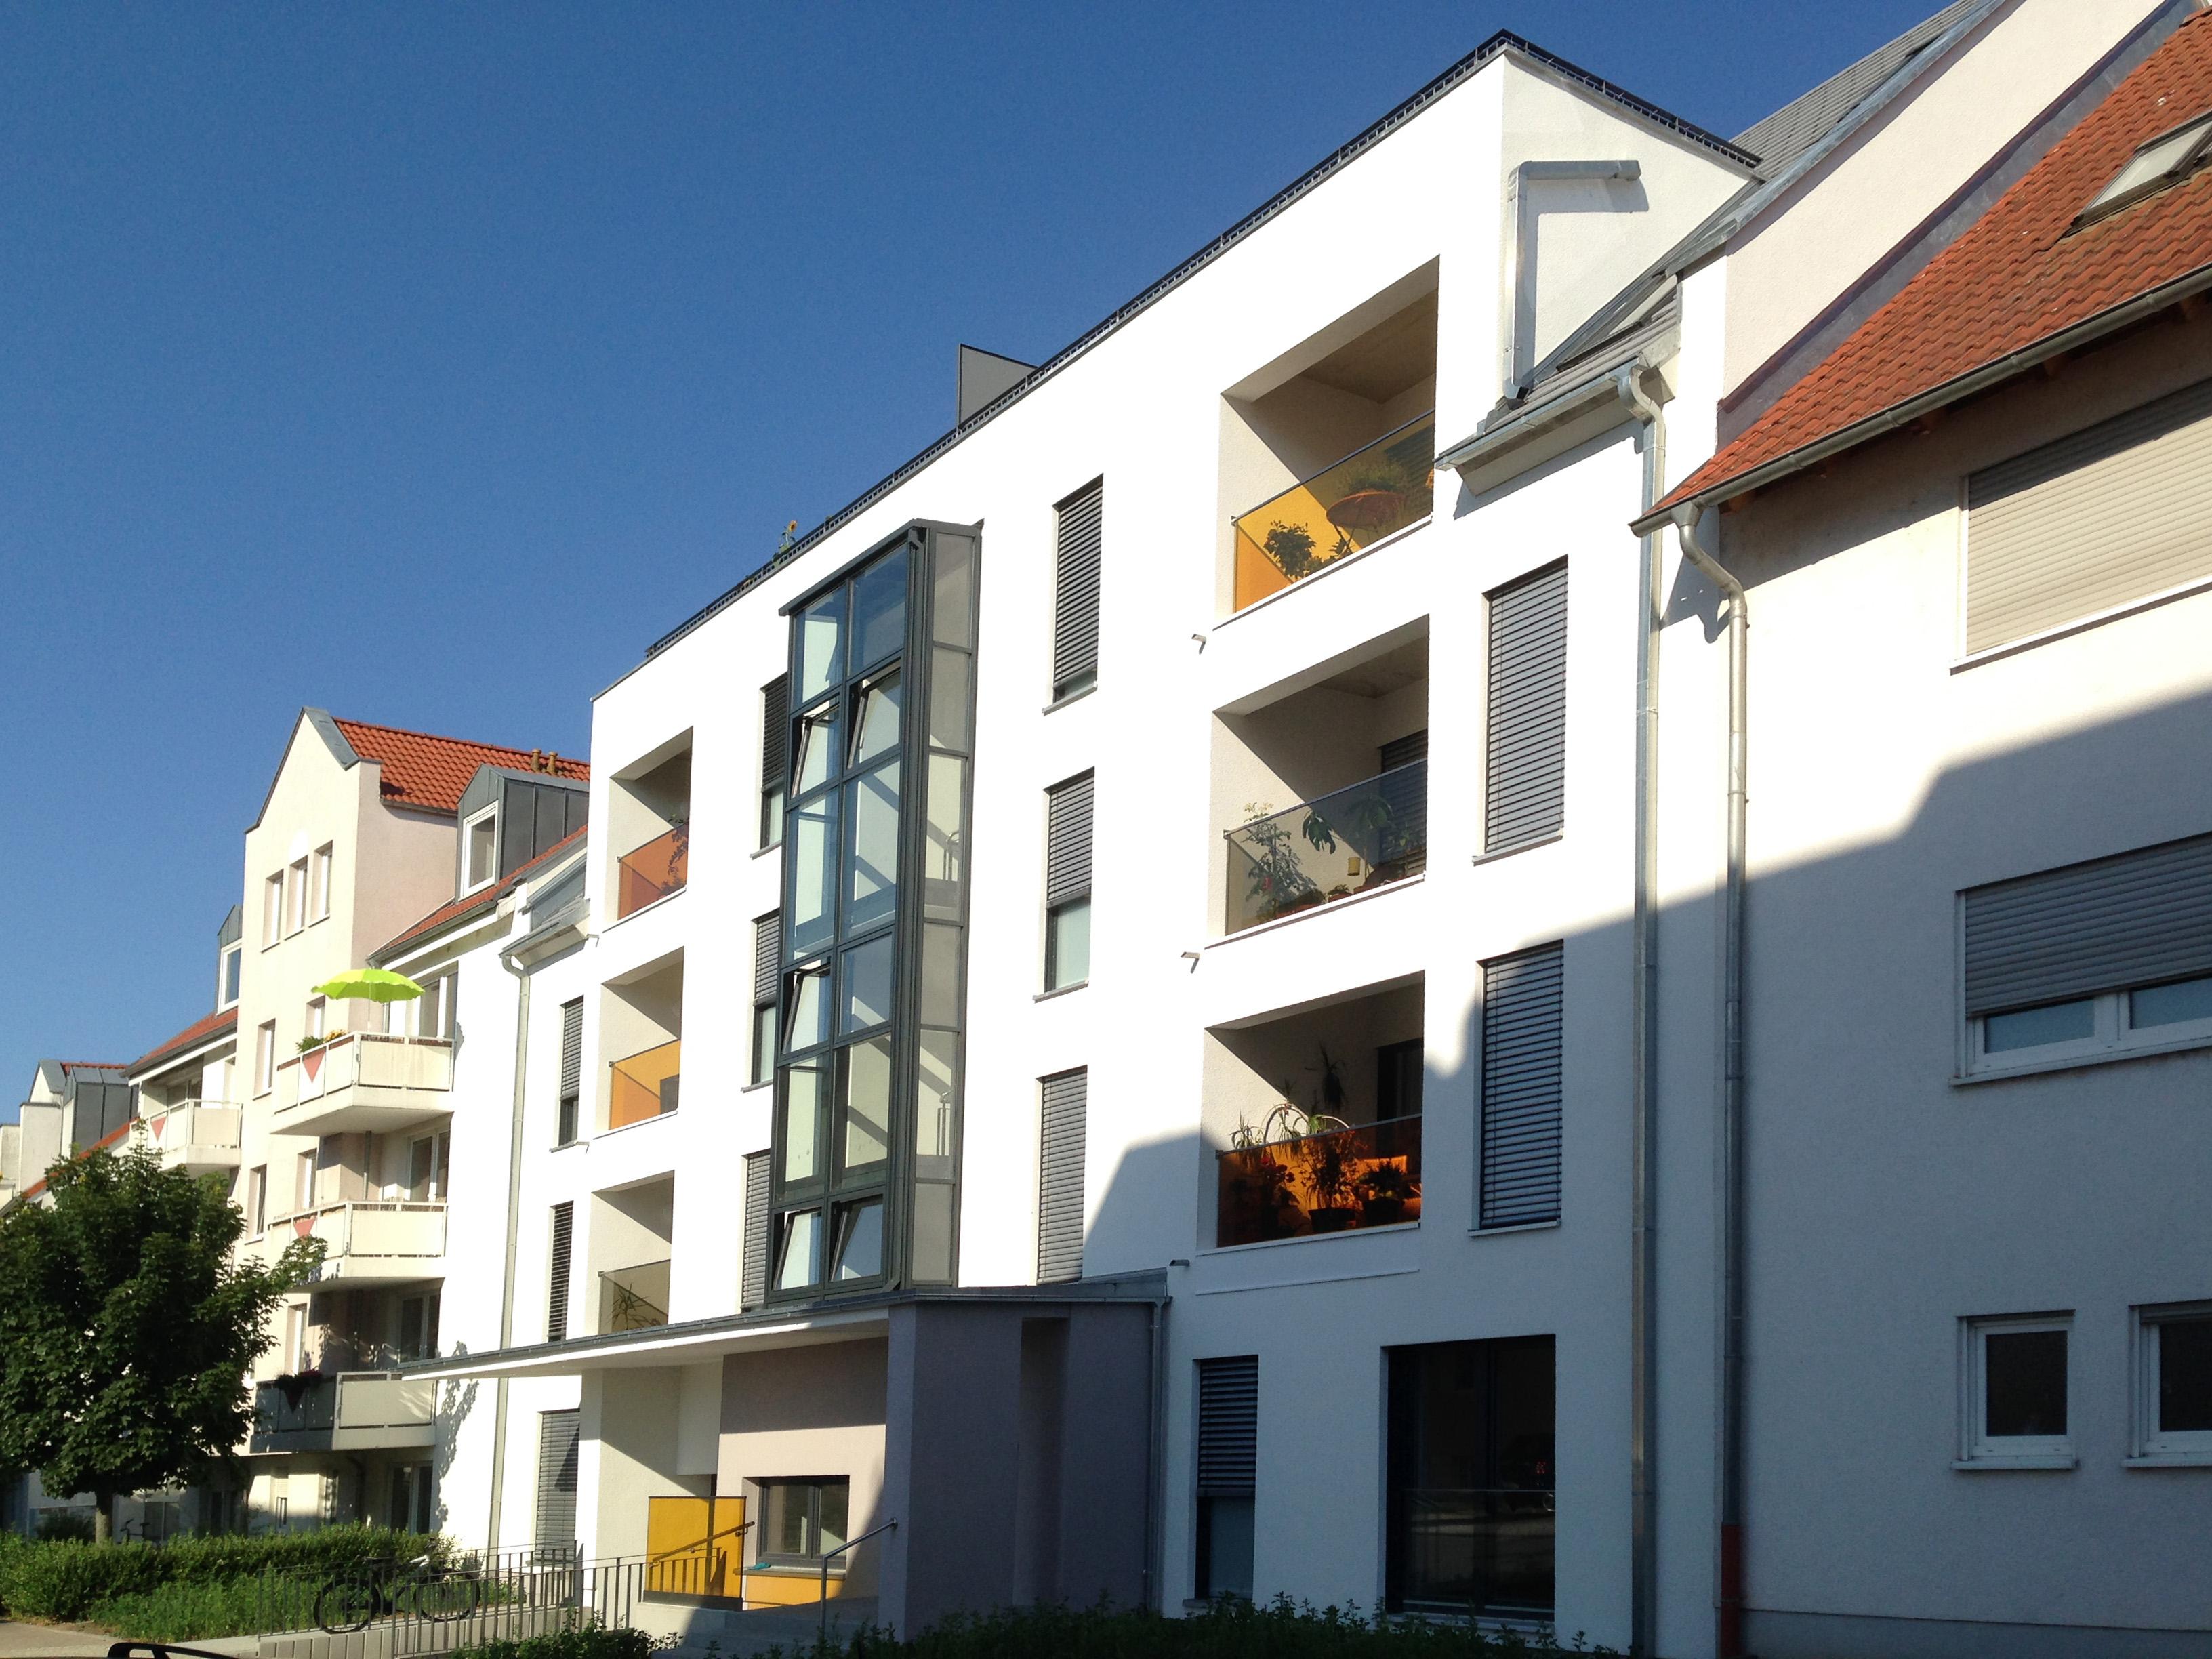 l ckenbebauung mehrfamilienhaus kfw 70 in jena architekturf hrer th ringen. Black Bedroom Furniture Sets. Home Design Ideas